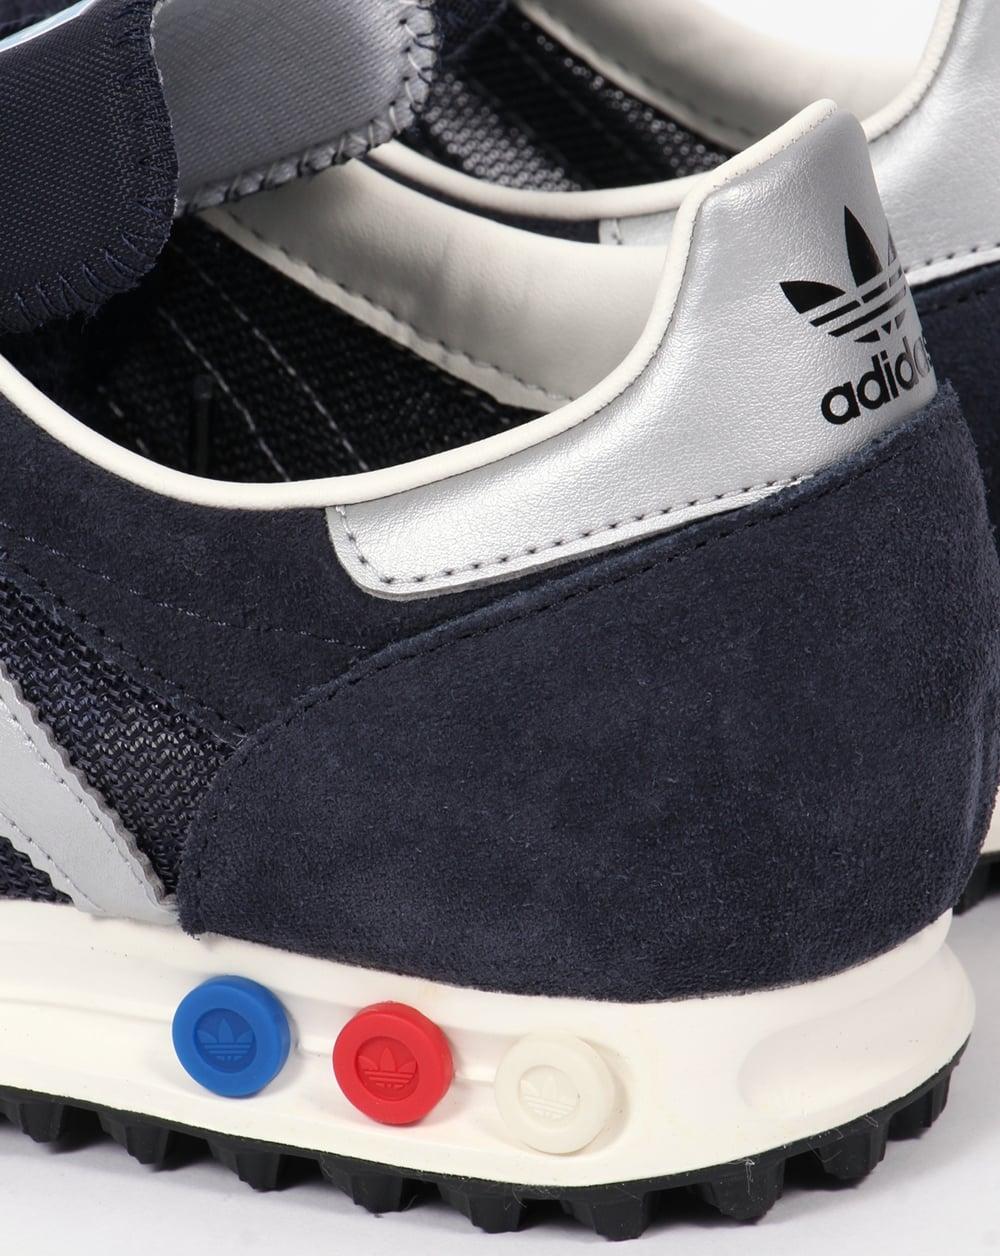 c6d663ee4d8d Adidas LA Trainer OG Trainers Navy Silver